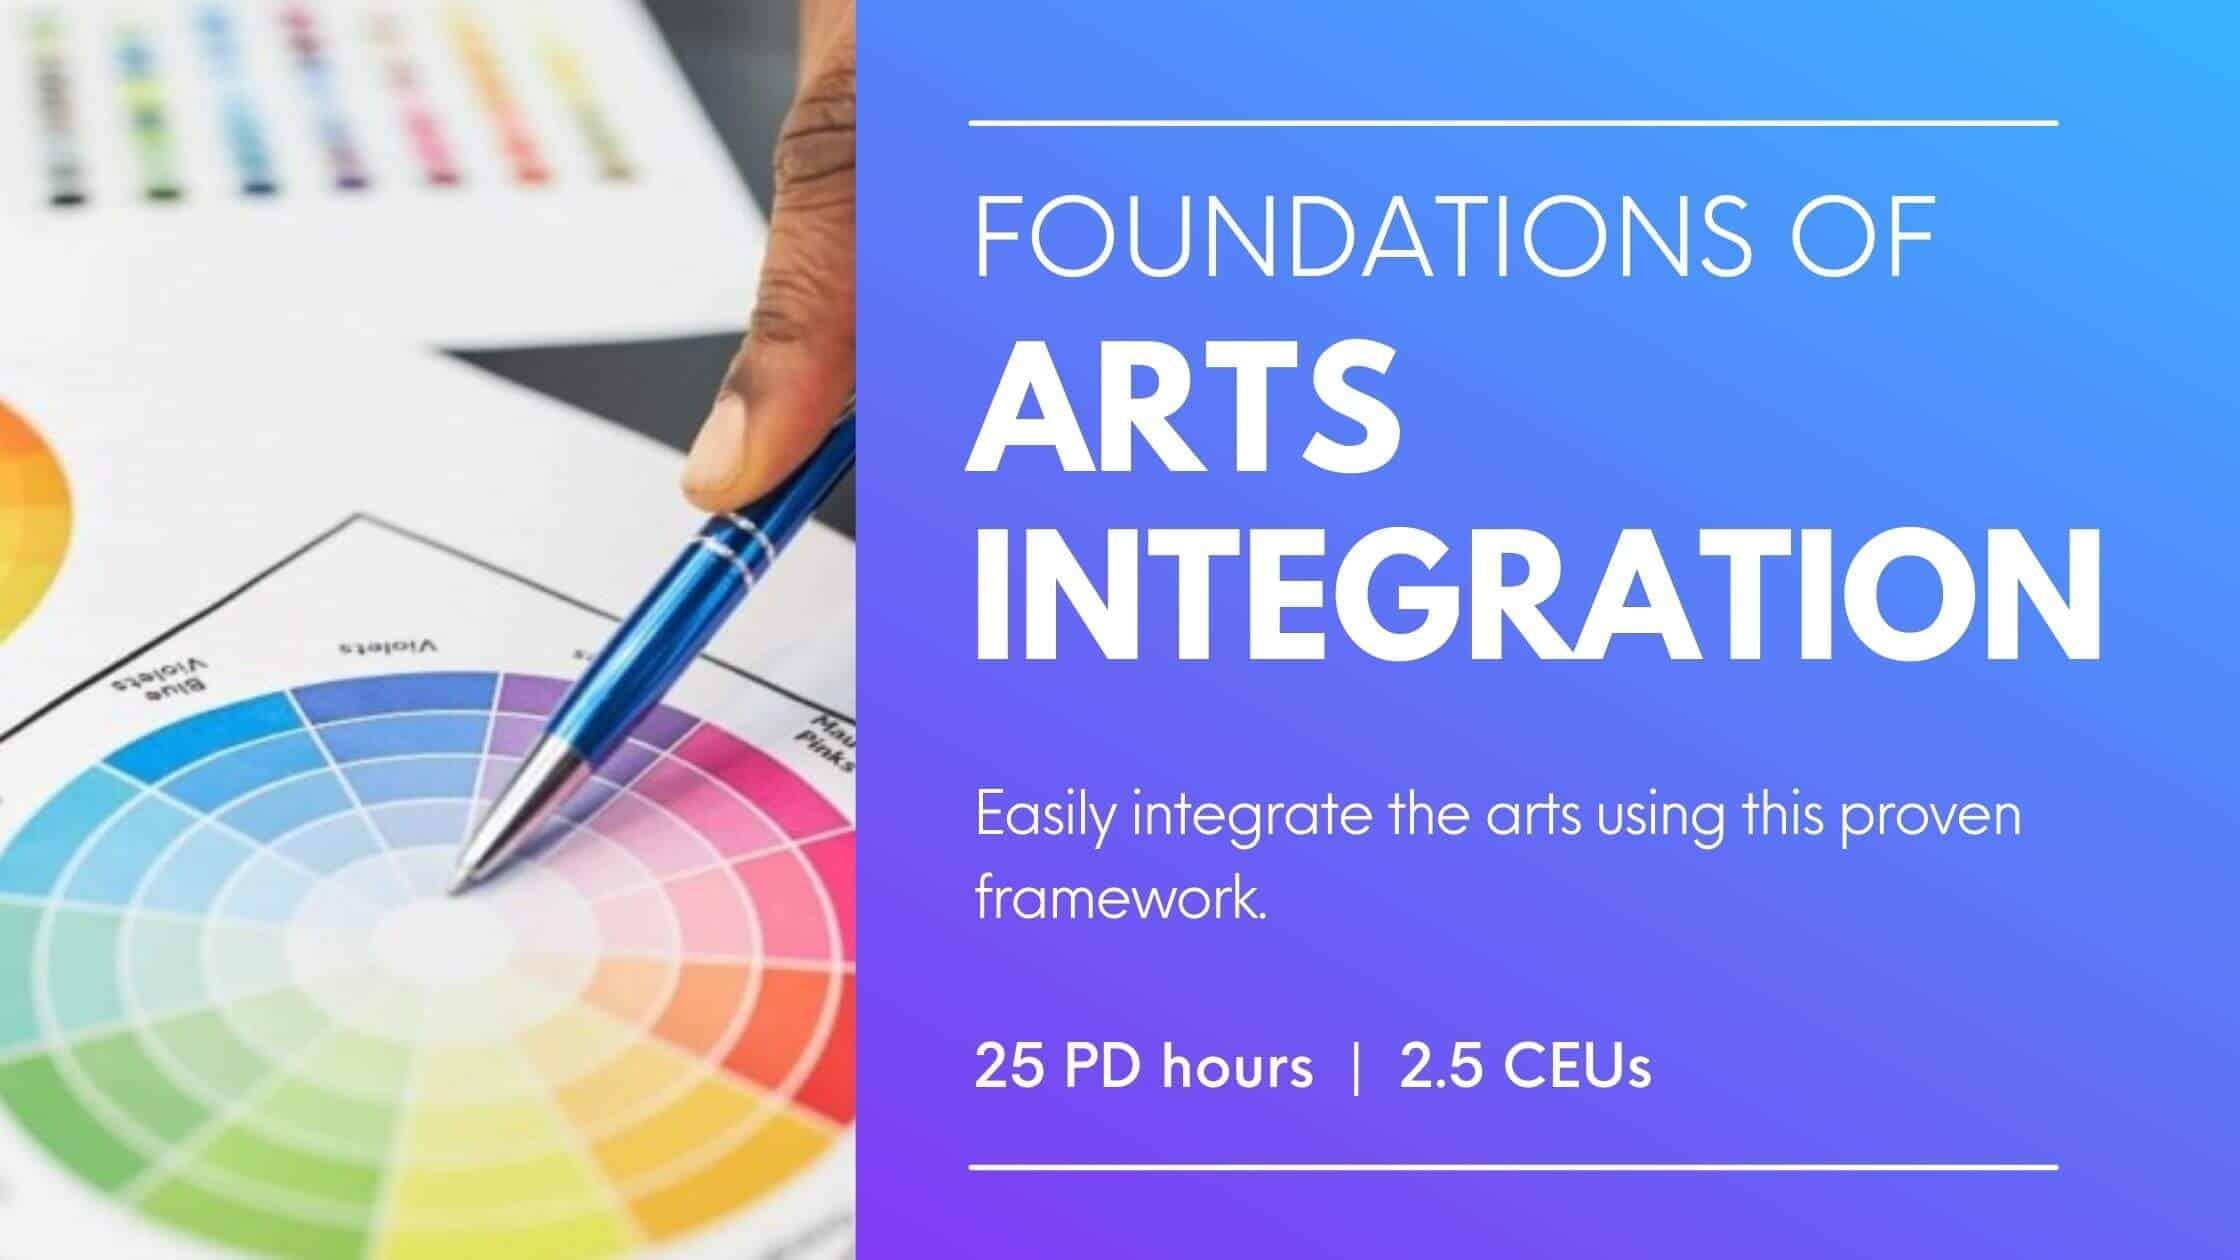 Foundations of Arts Integration